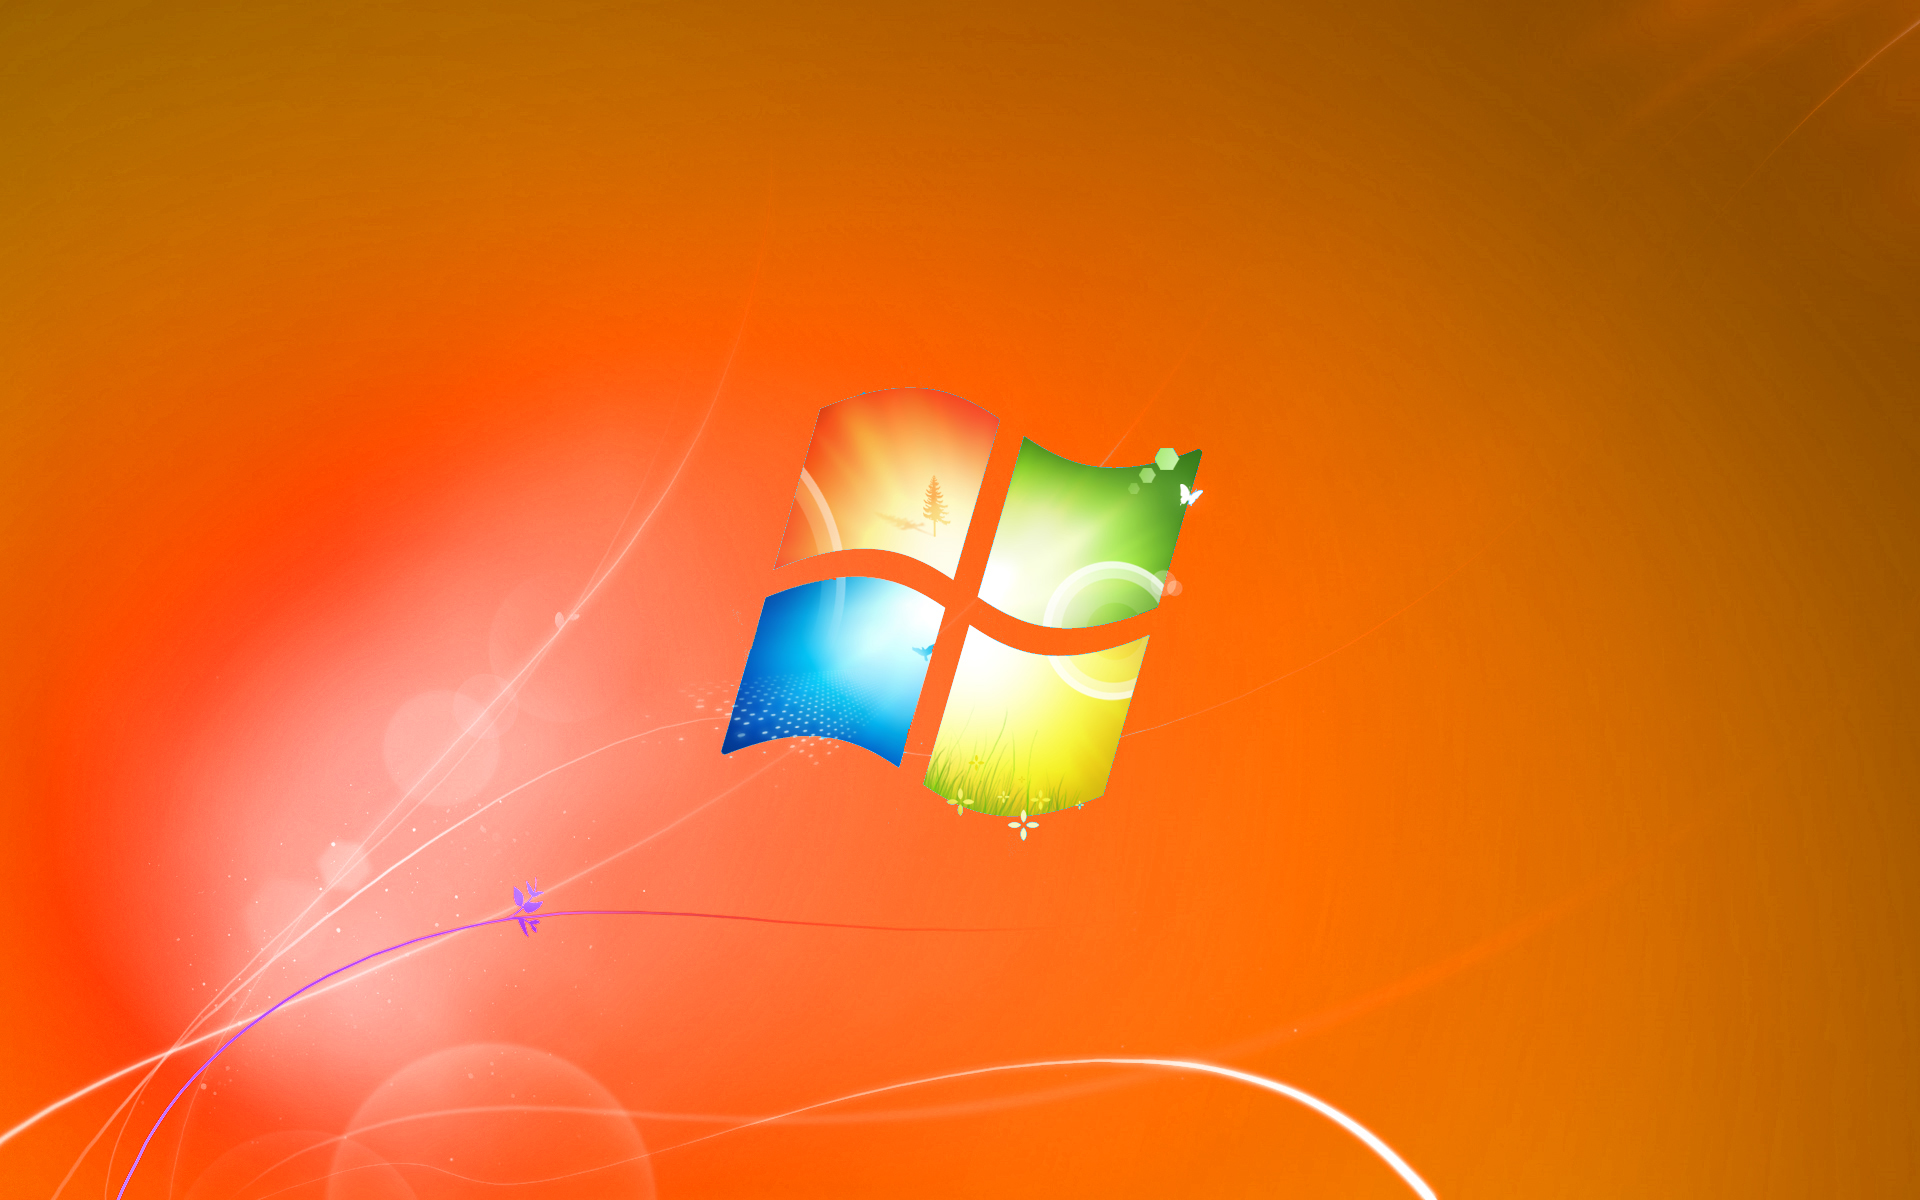 windows 7 default wallpaper orange version by dominichulme